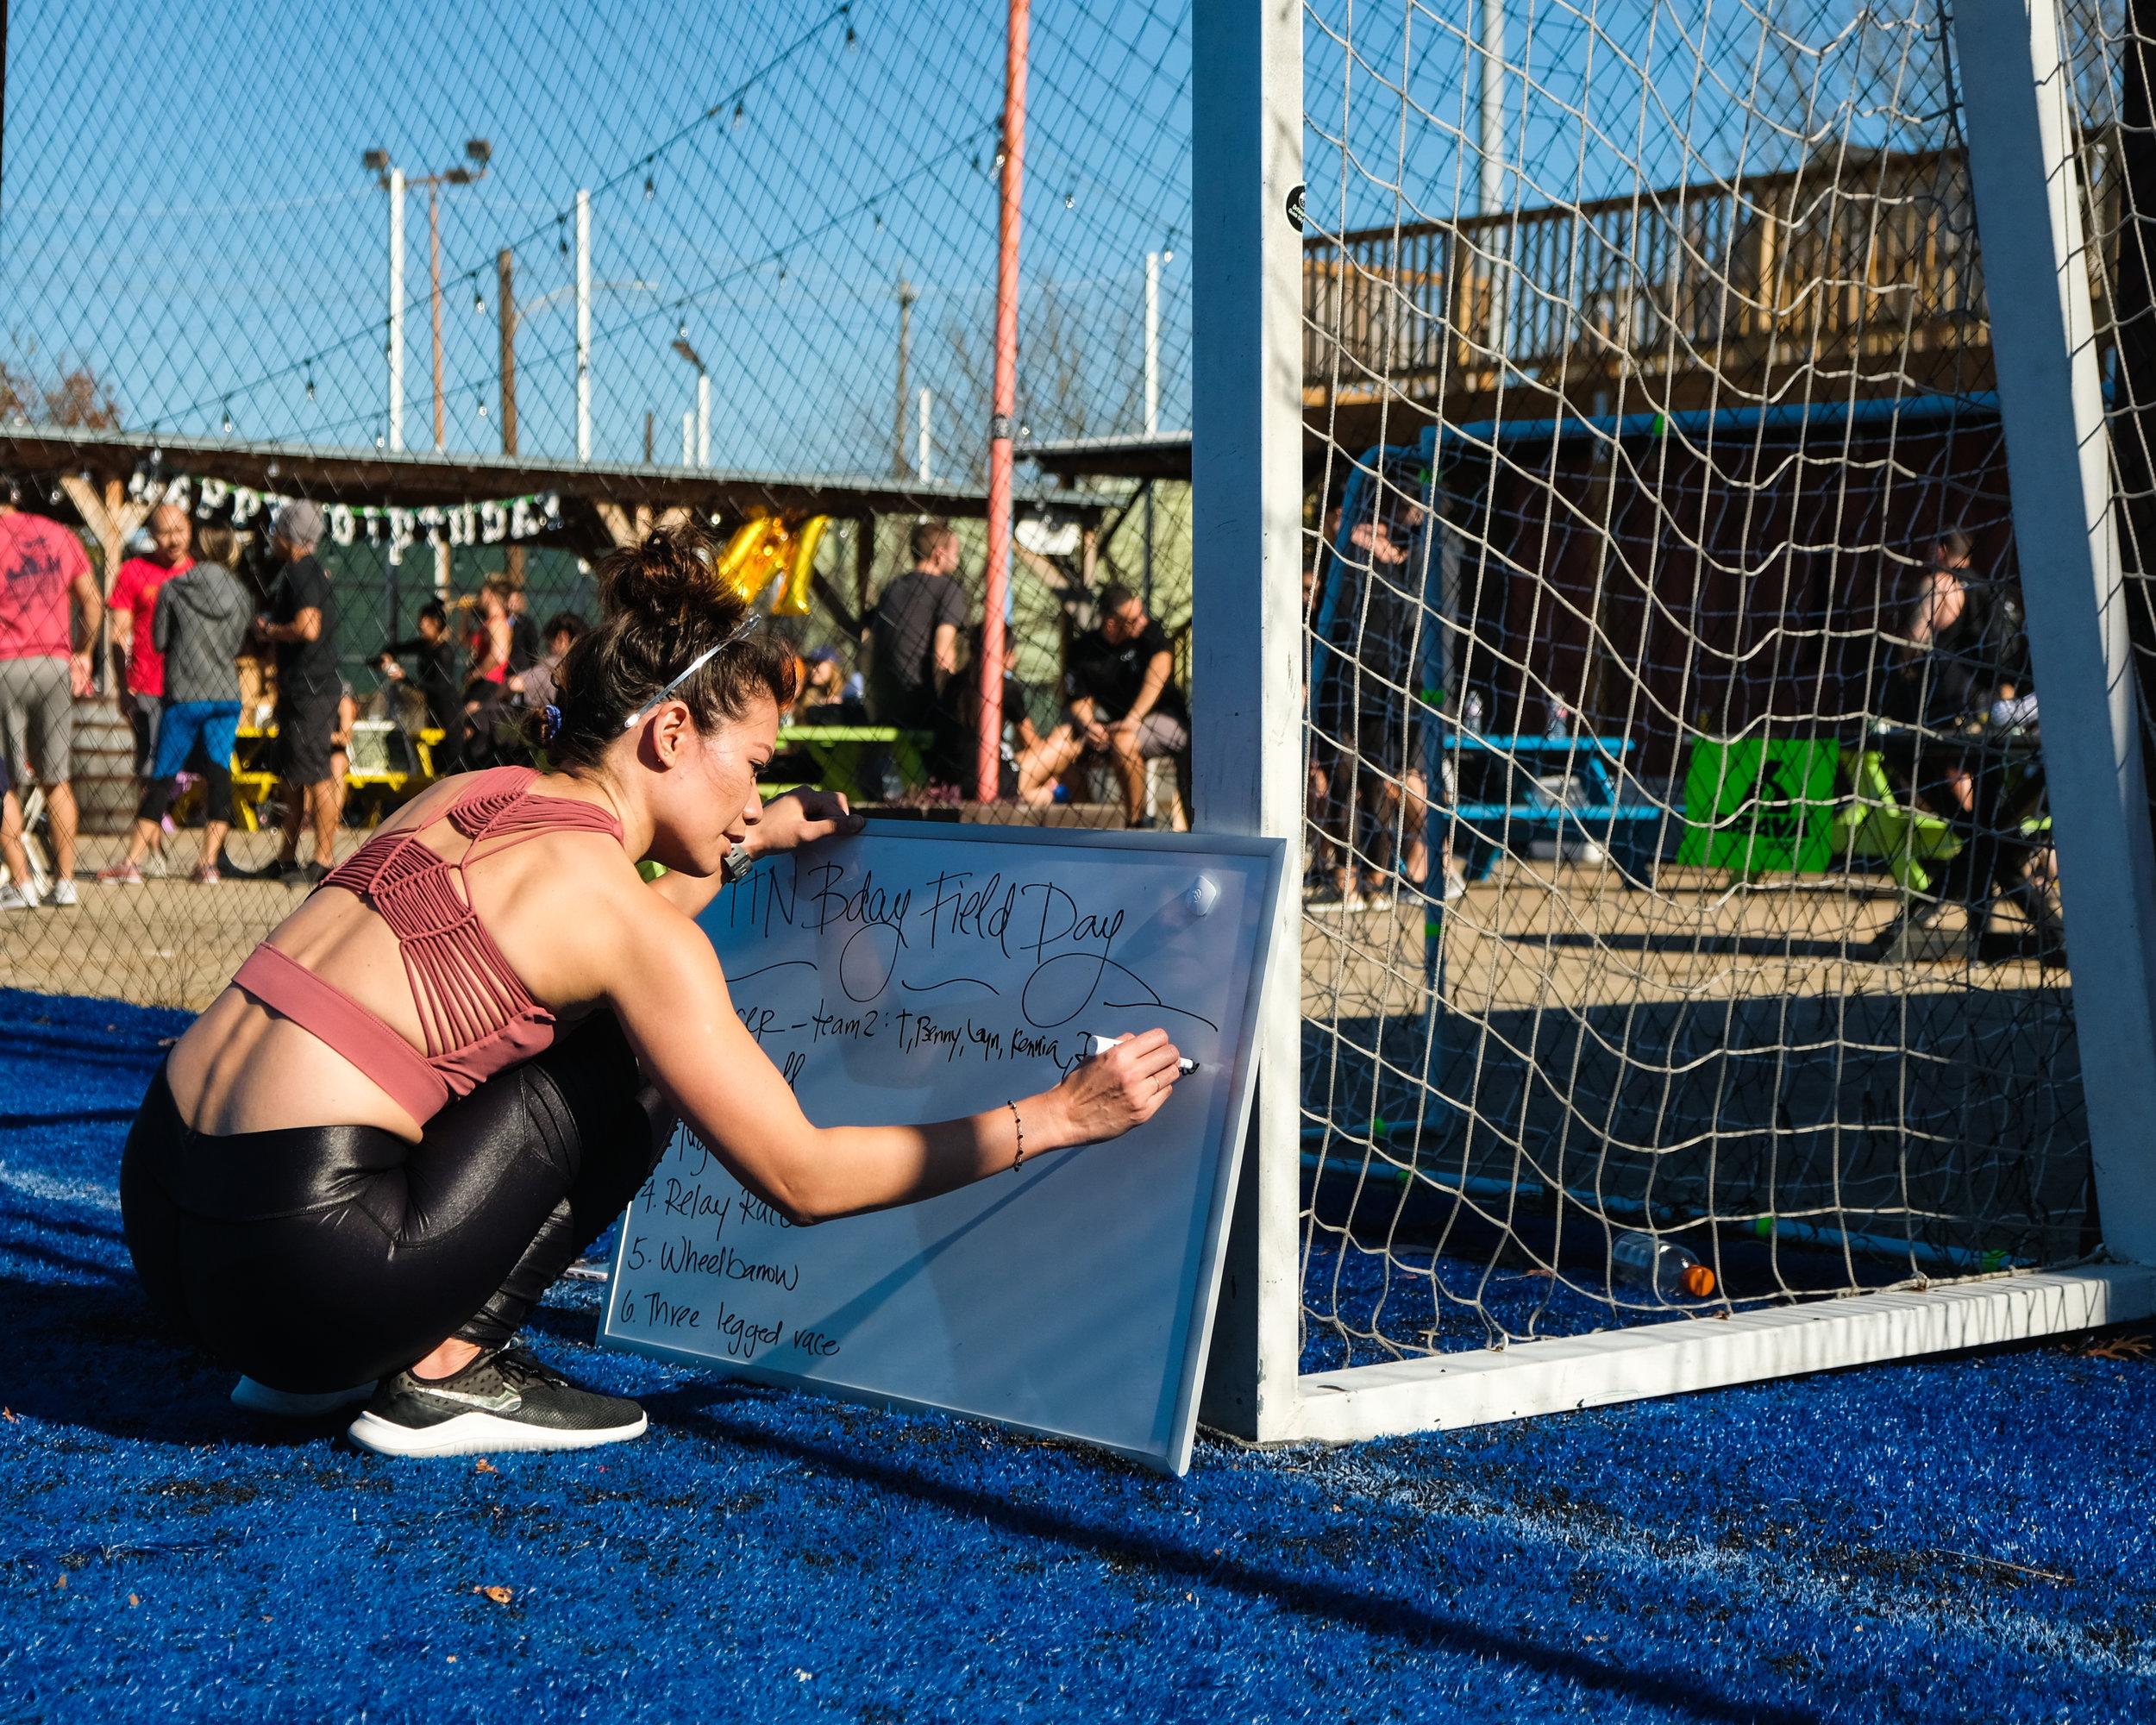 TTN Bday Field Day Games: Soccer, Tug of War, Relay Race, Wheelbarrow, and Three Legged Race